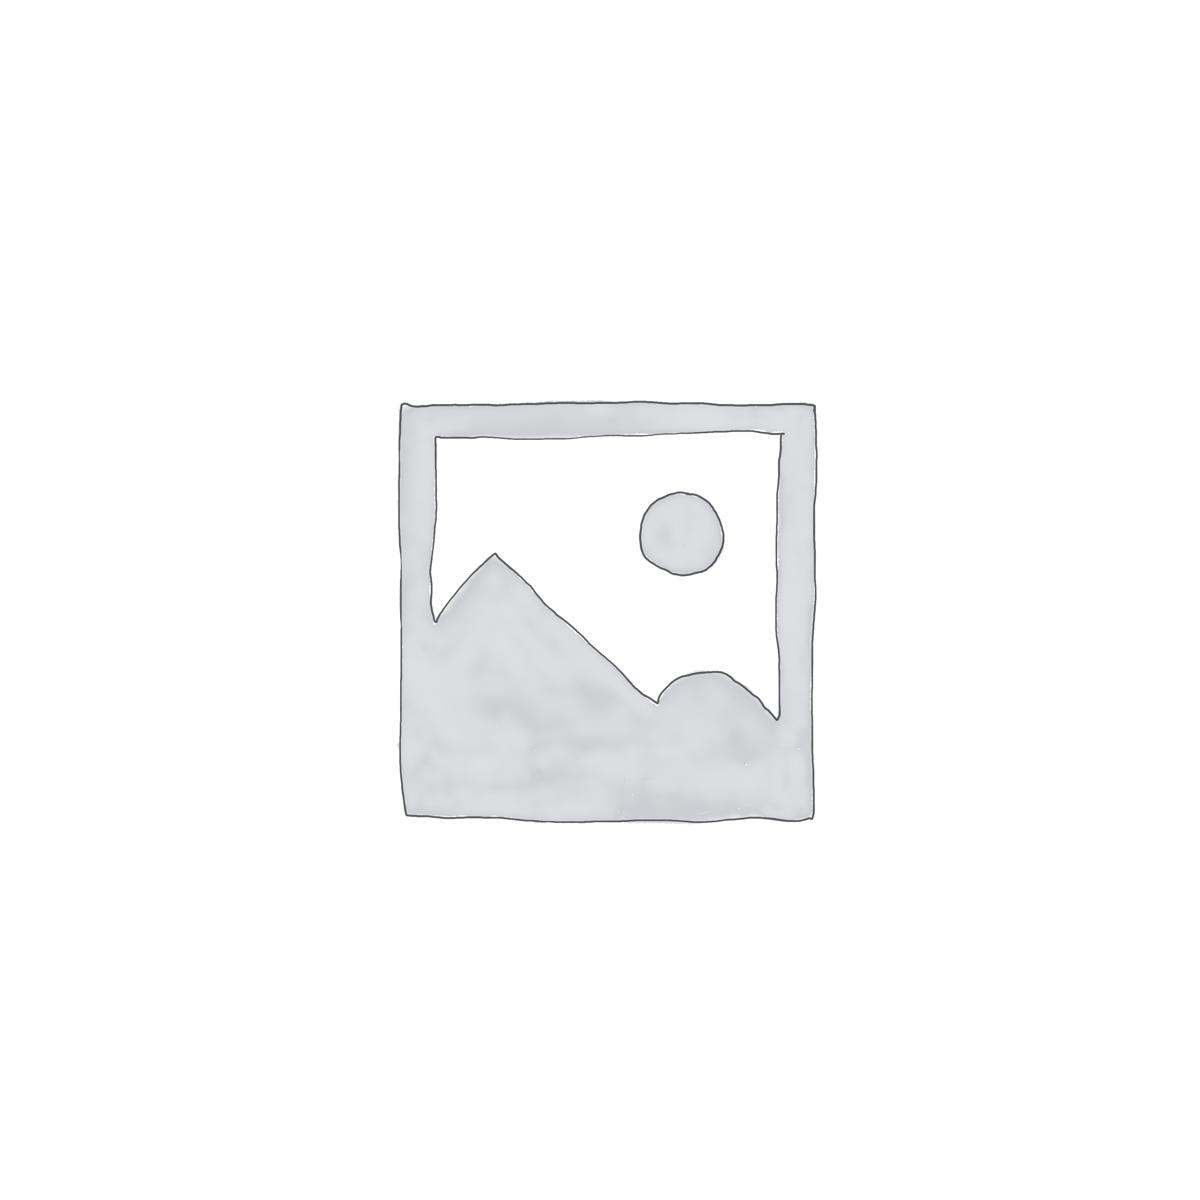 Gold Gray Polygonal Square Geometric Pattern Wallpaper Mural